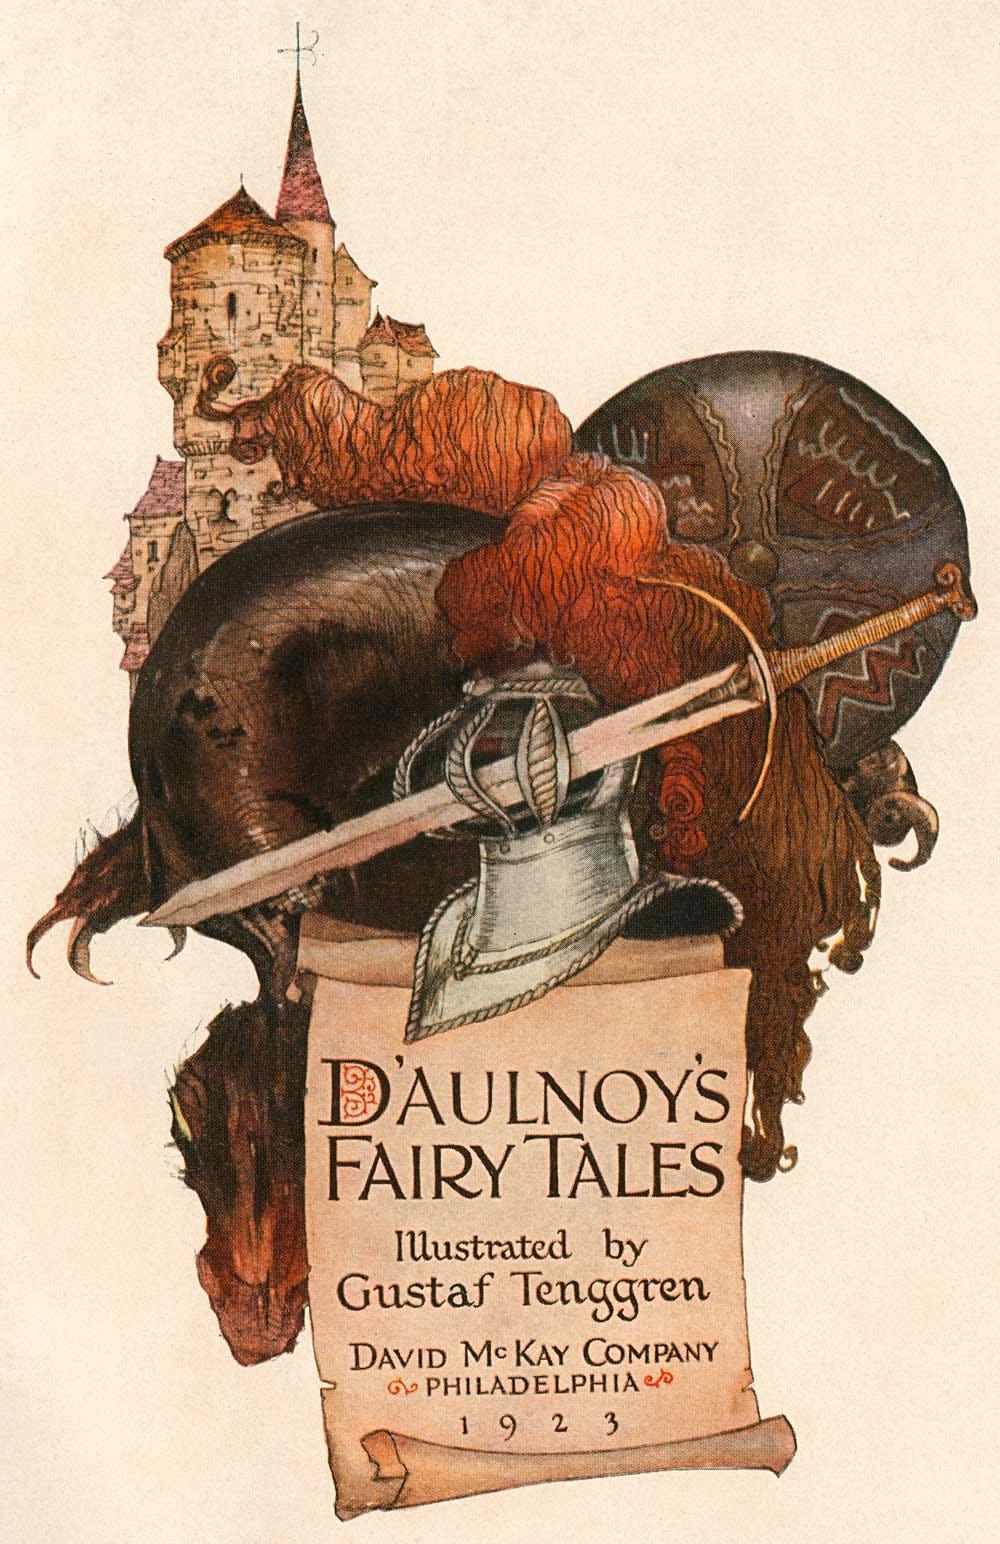 Gustaf Adolf Tenggren - D'Aulnoy's Fairy Tales